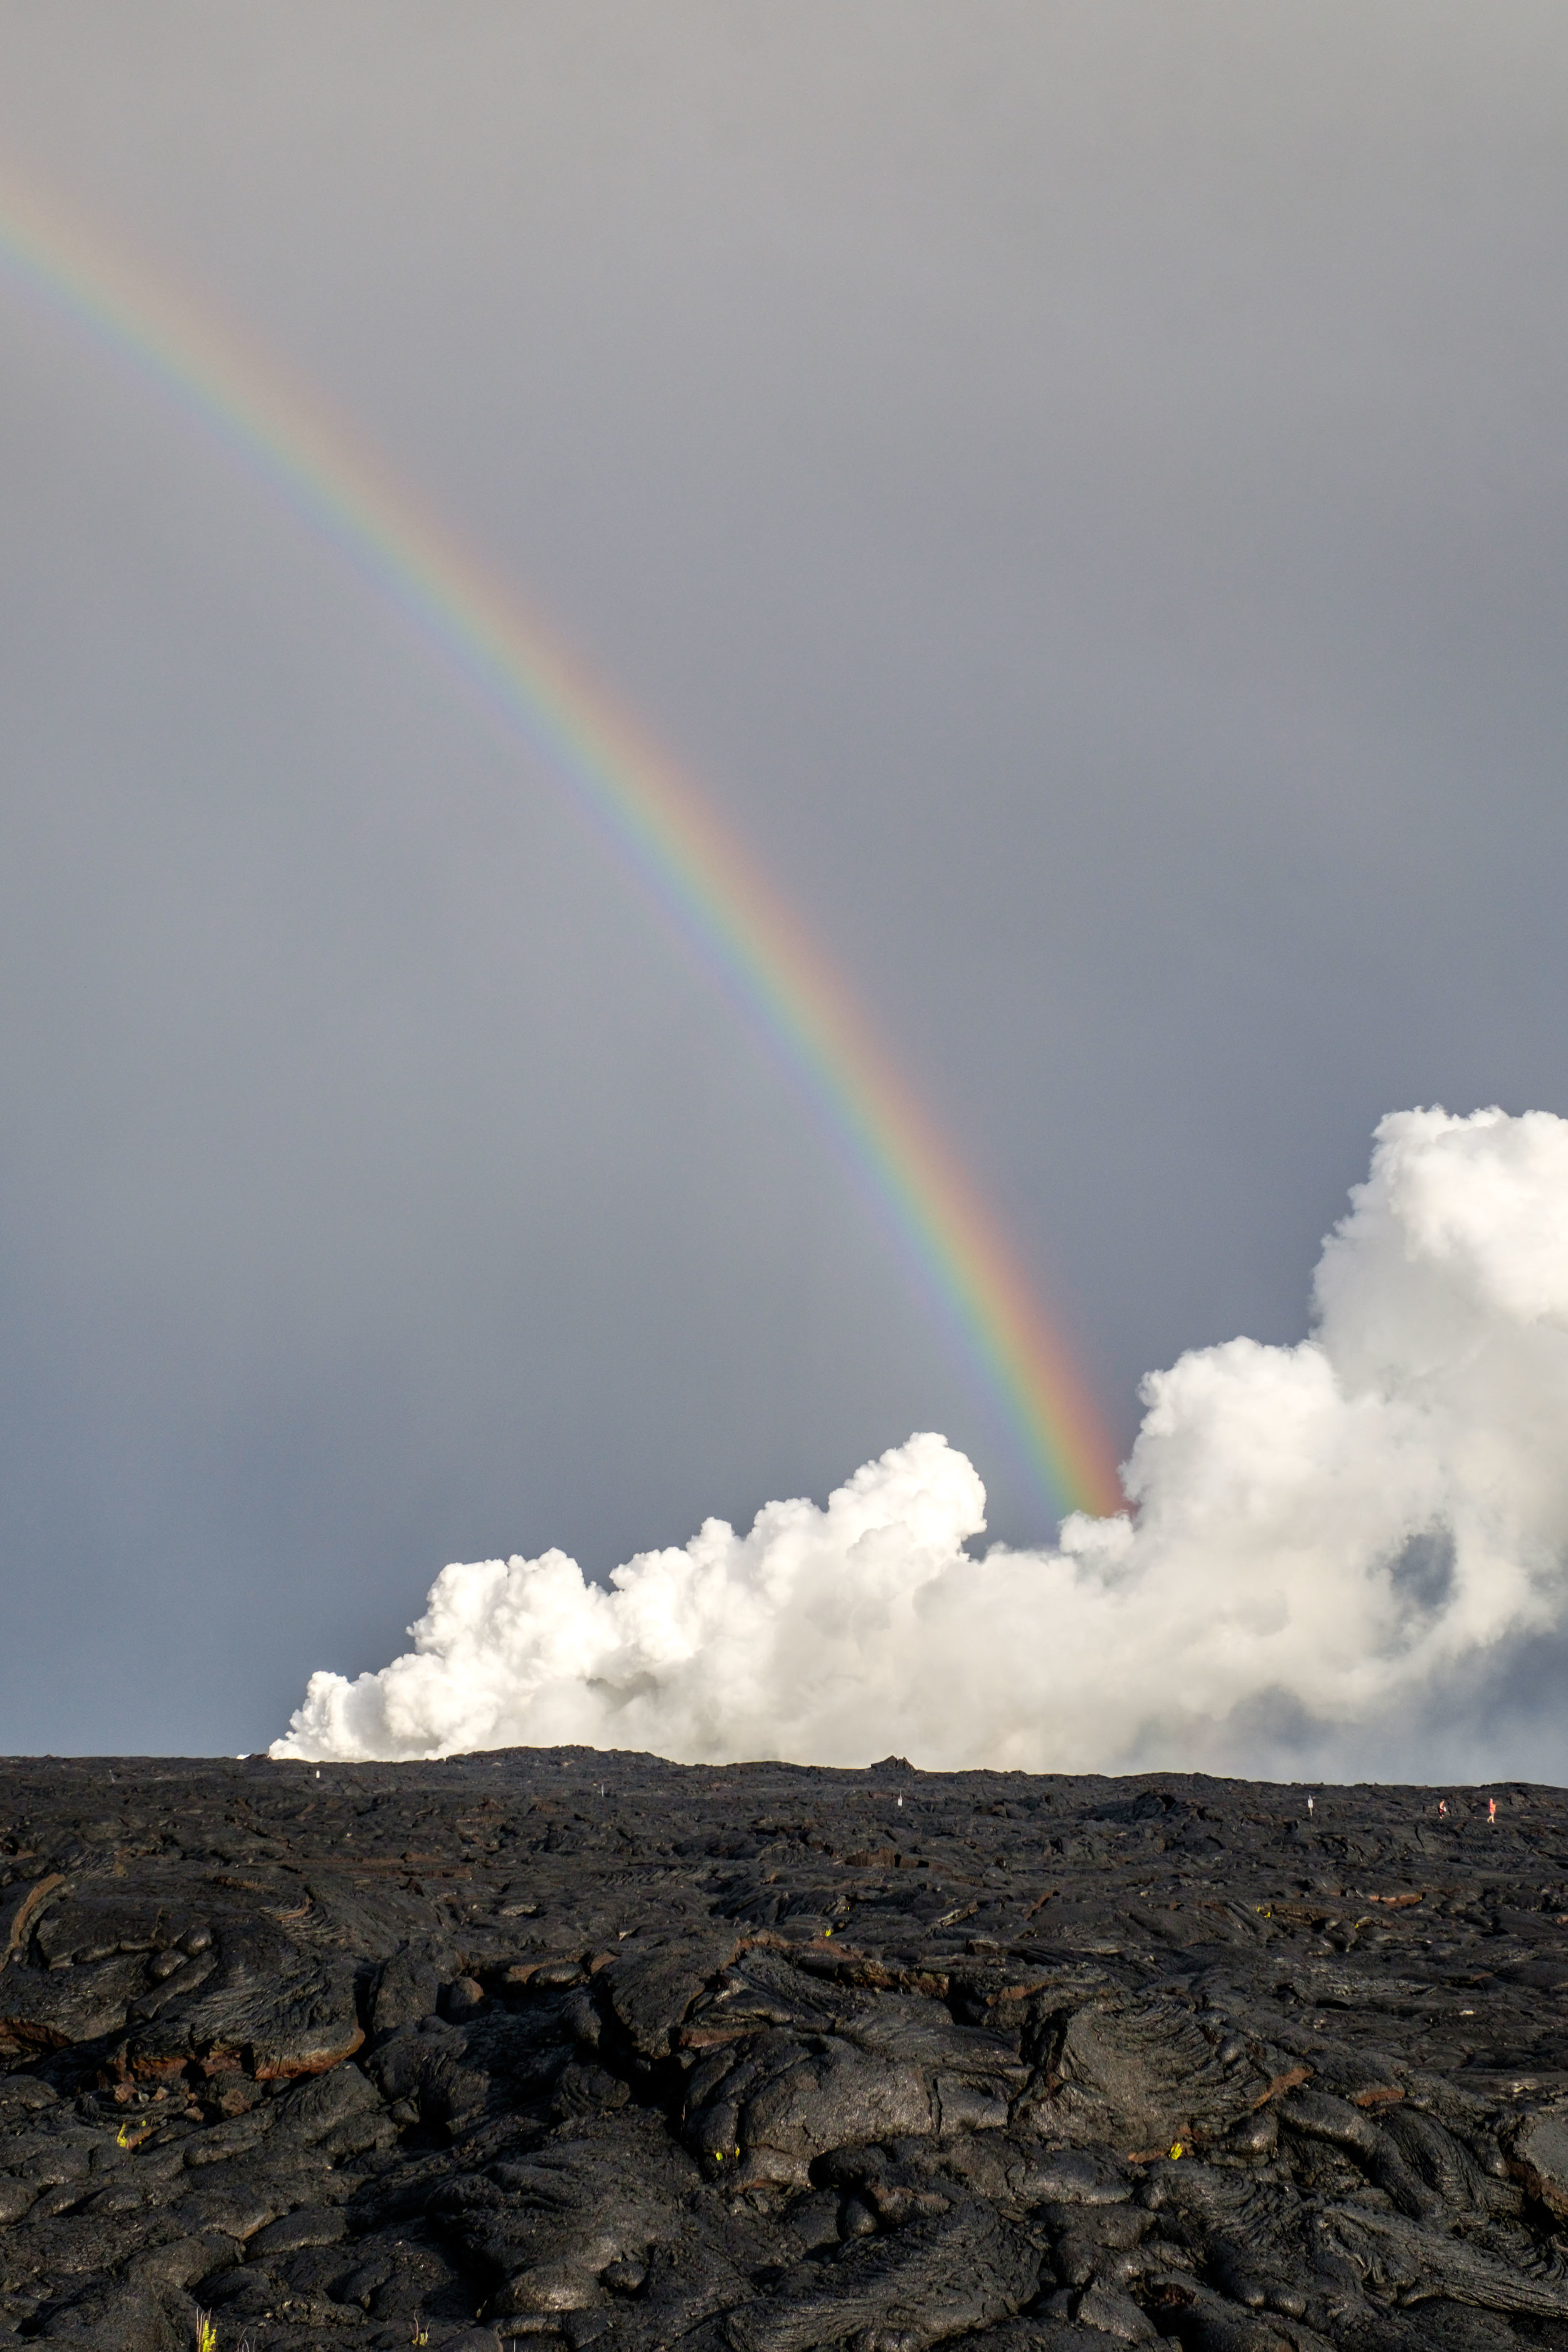 Rainbows and lava flows.